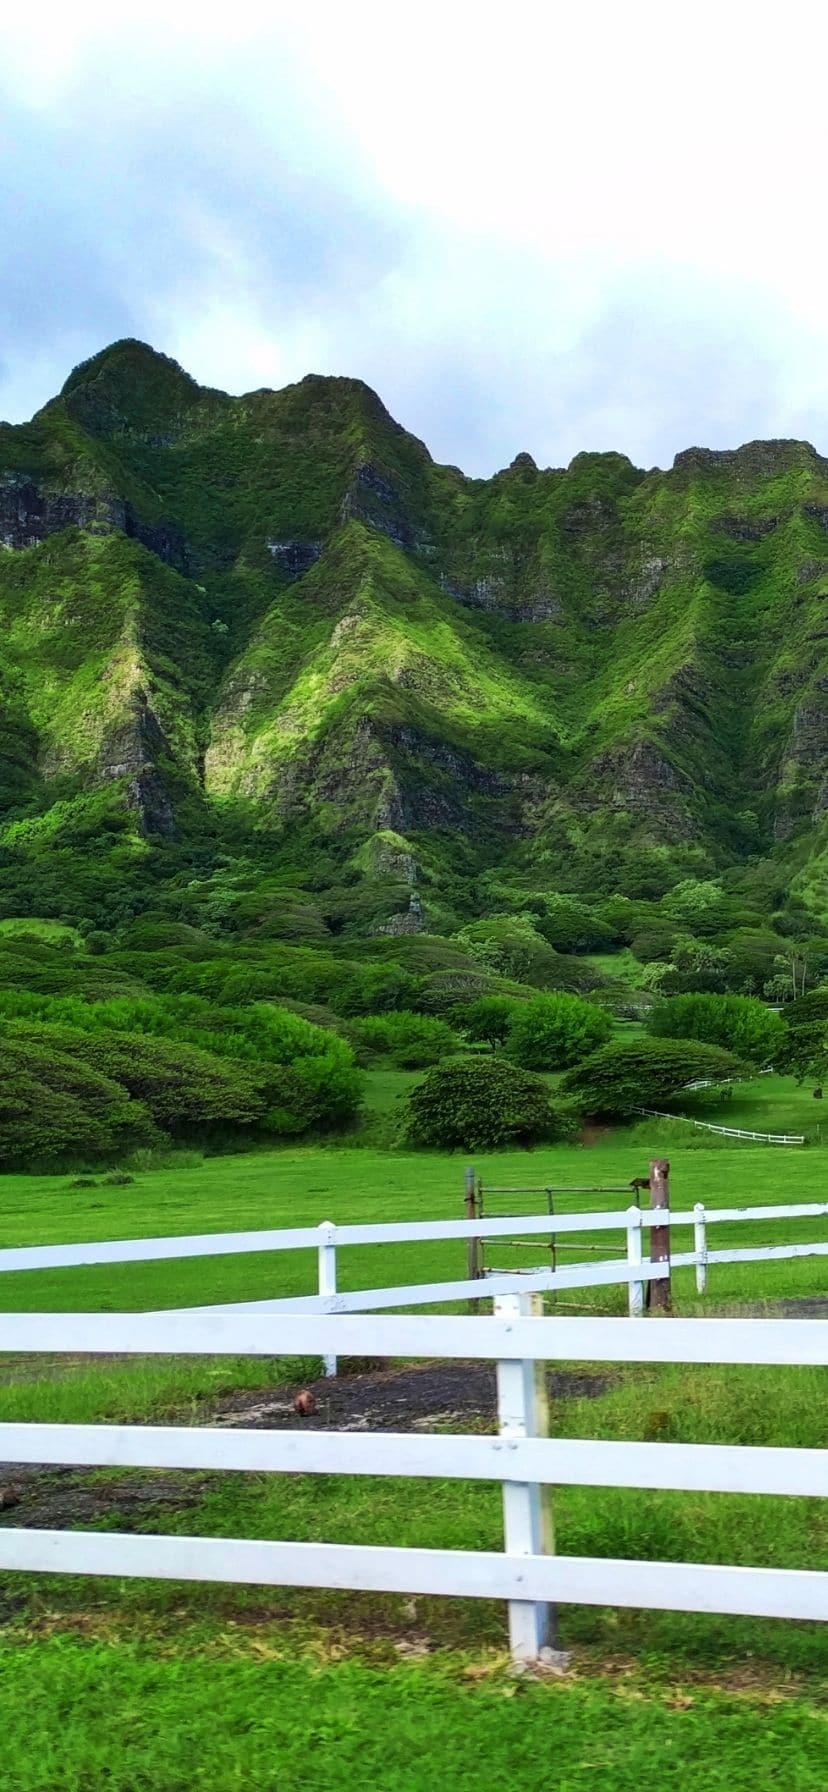 Green mountains at Kualoa Ranch, Oahu North Shore